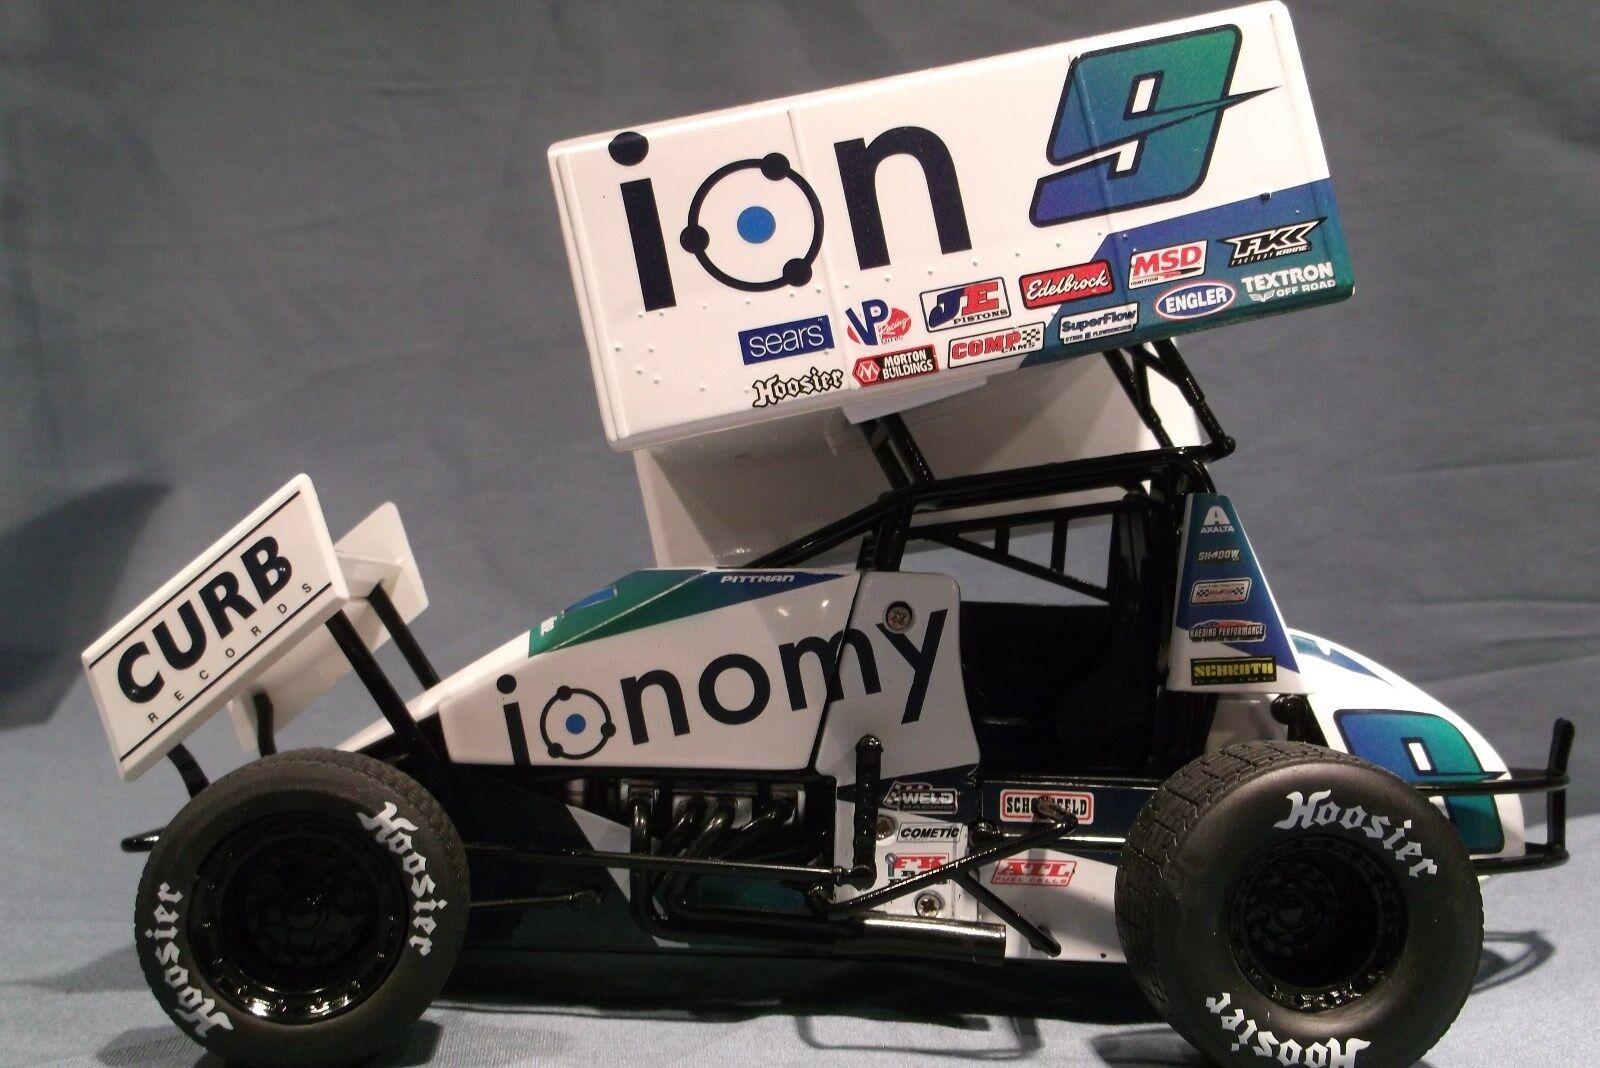 Daryn pittman ionomy kasey kahne racing sprint auto r & r 18 gmp - welt der gesetzlosen